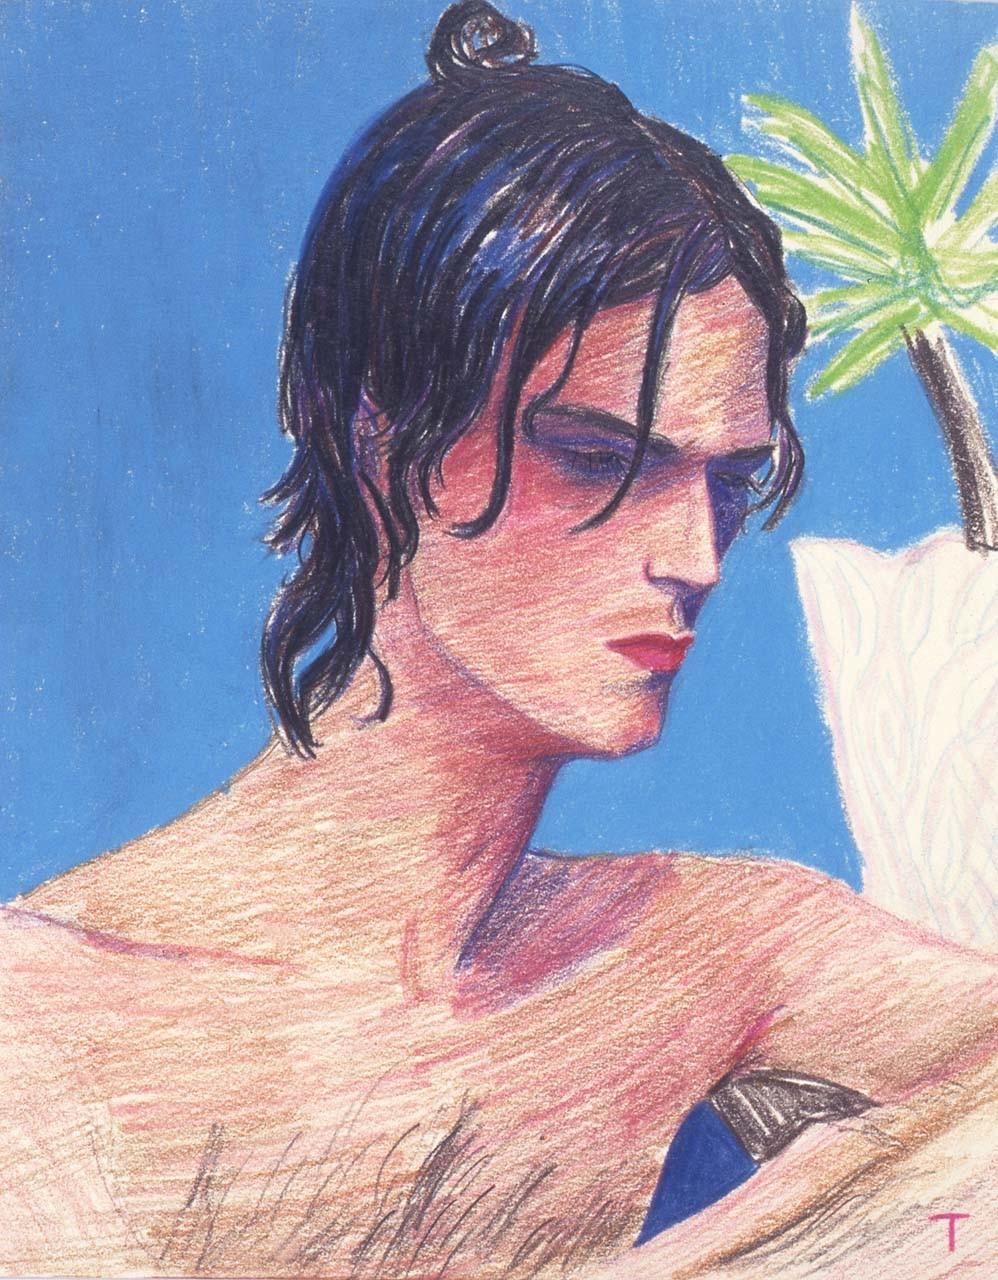 "<div class=""artwork_caption""><p>Pool St. Kitts, 1999</p></div>"